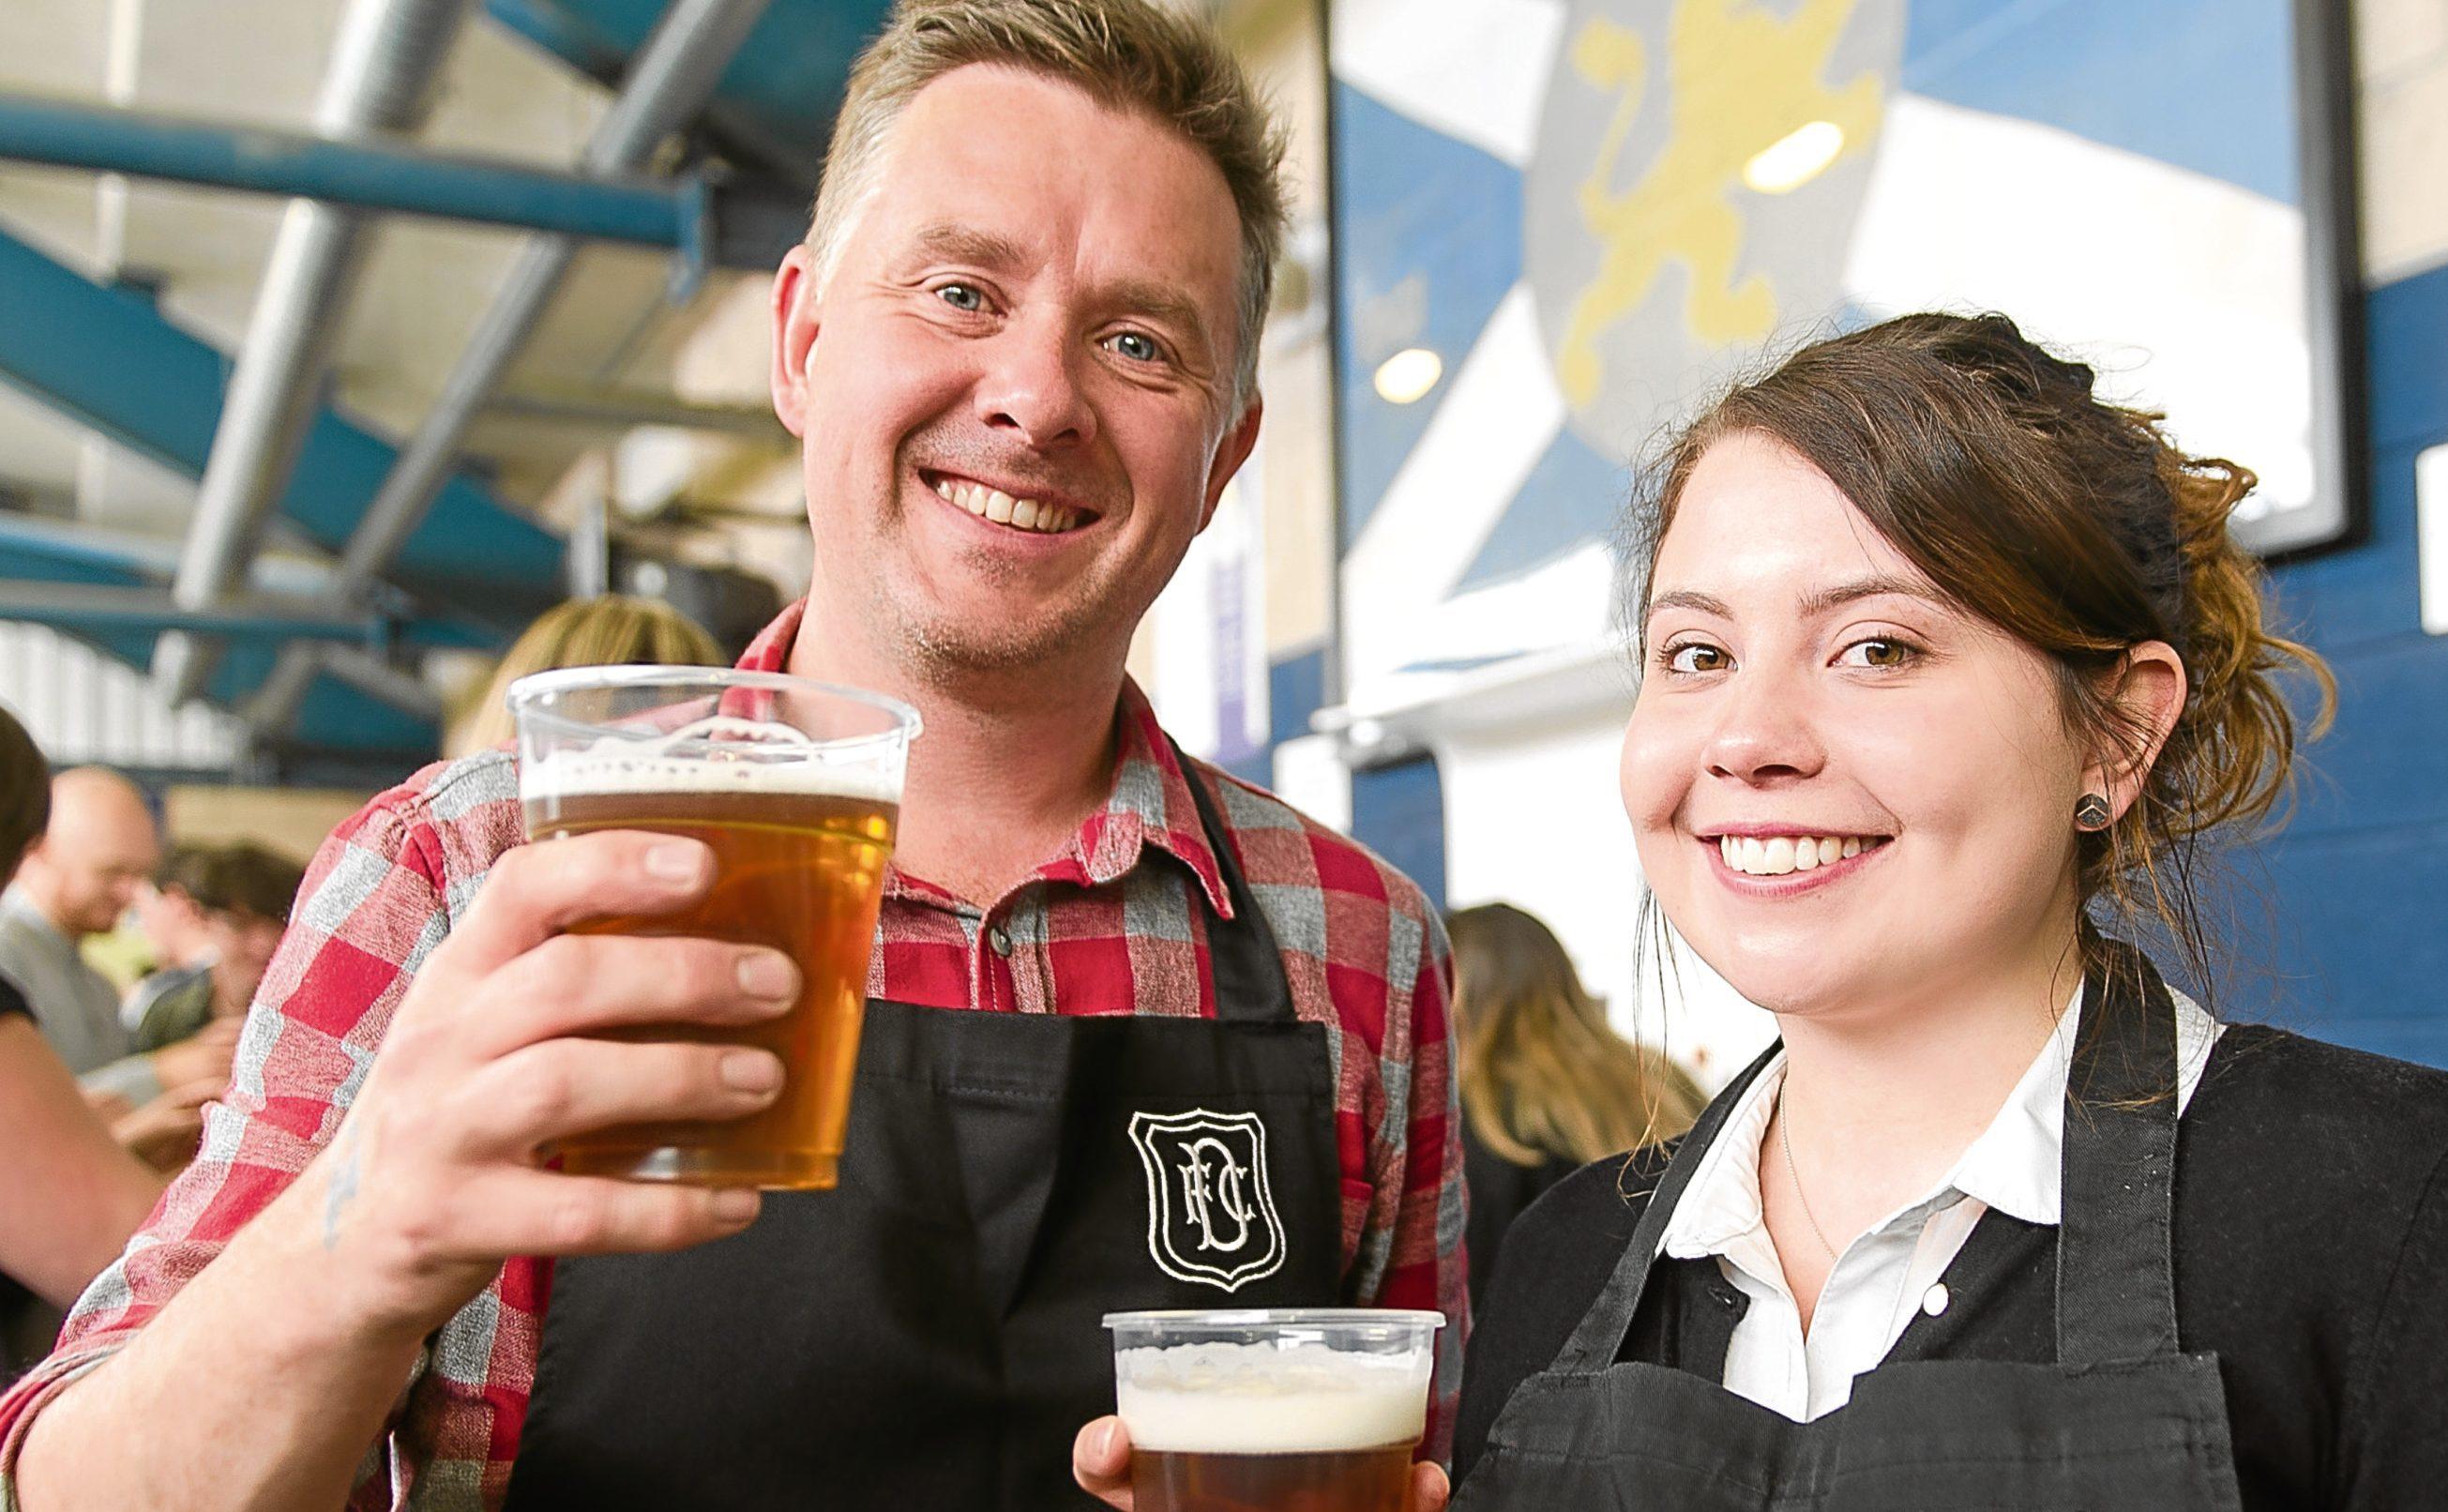 Organiser Jonny McInally and barmaid Iona Ramsay.